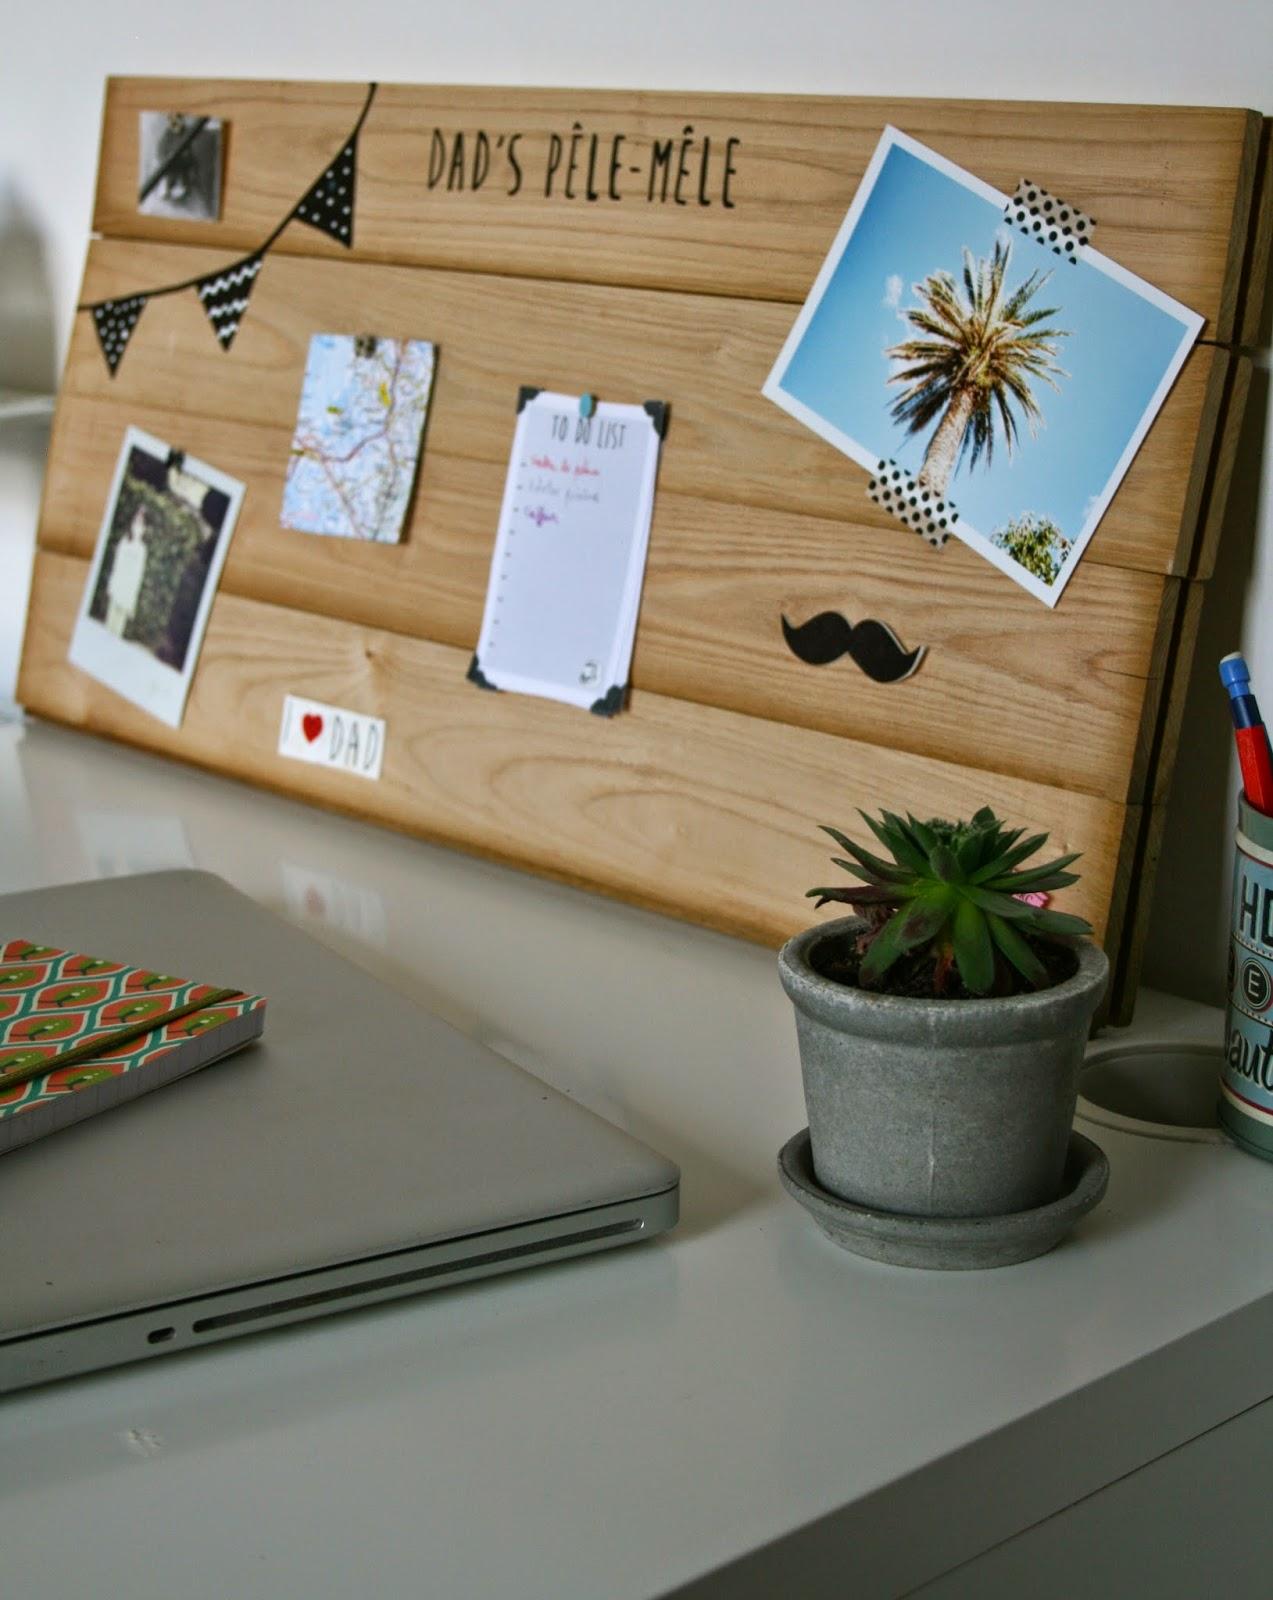 noix de cocoon juin 2014. Black Bedroom Furniture Sets. Home Design Ideas